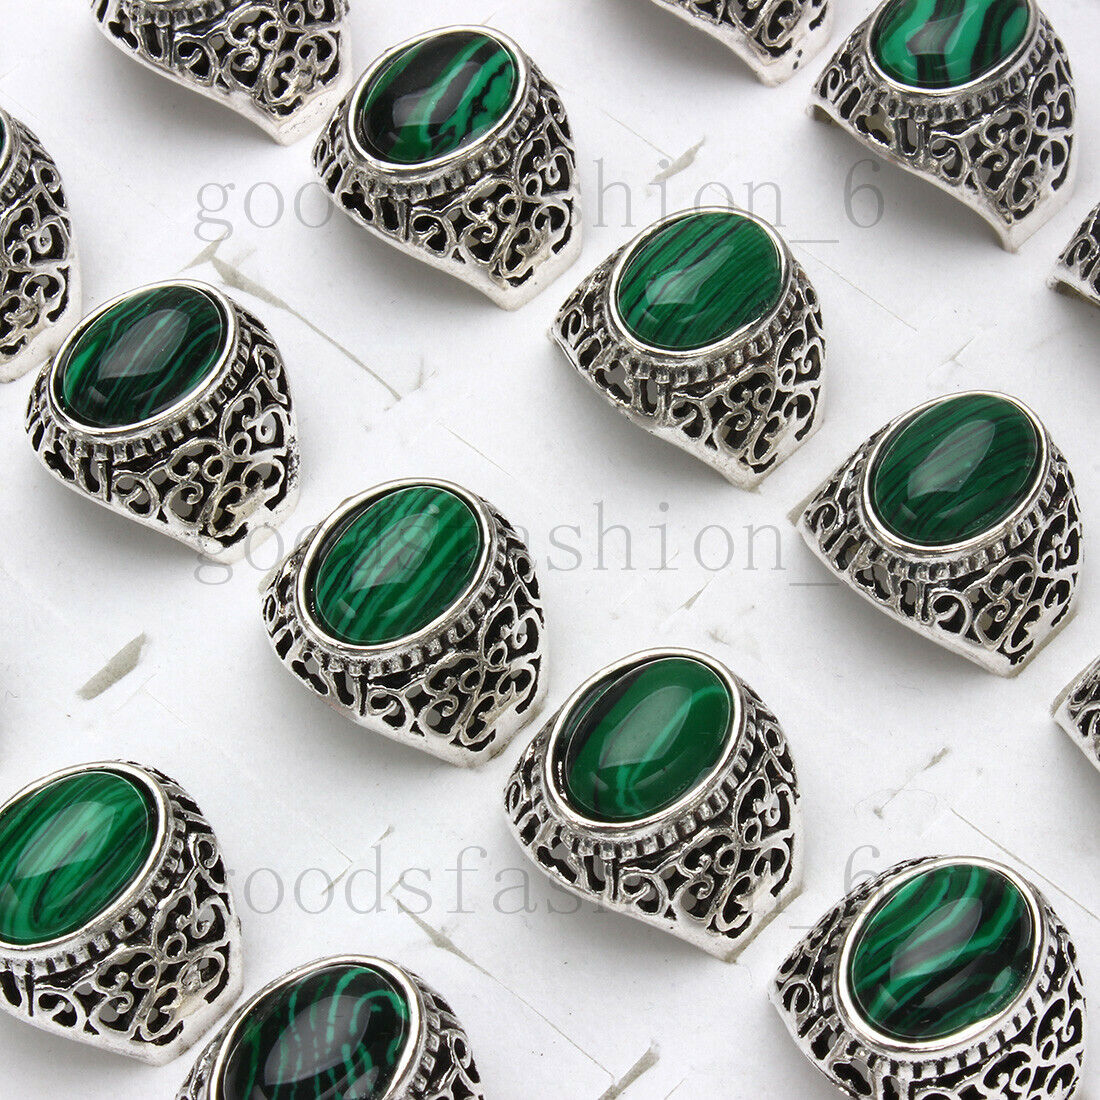 Wholesale lots 5-25pcs Natural Malachite Gemstone Stone Silver Tone Ring FREE